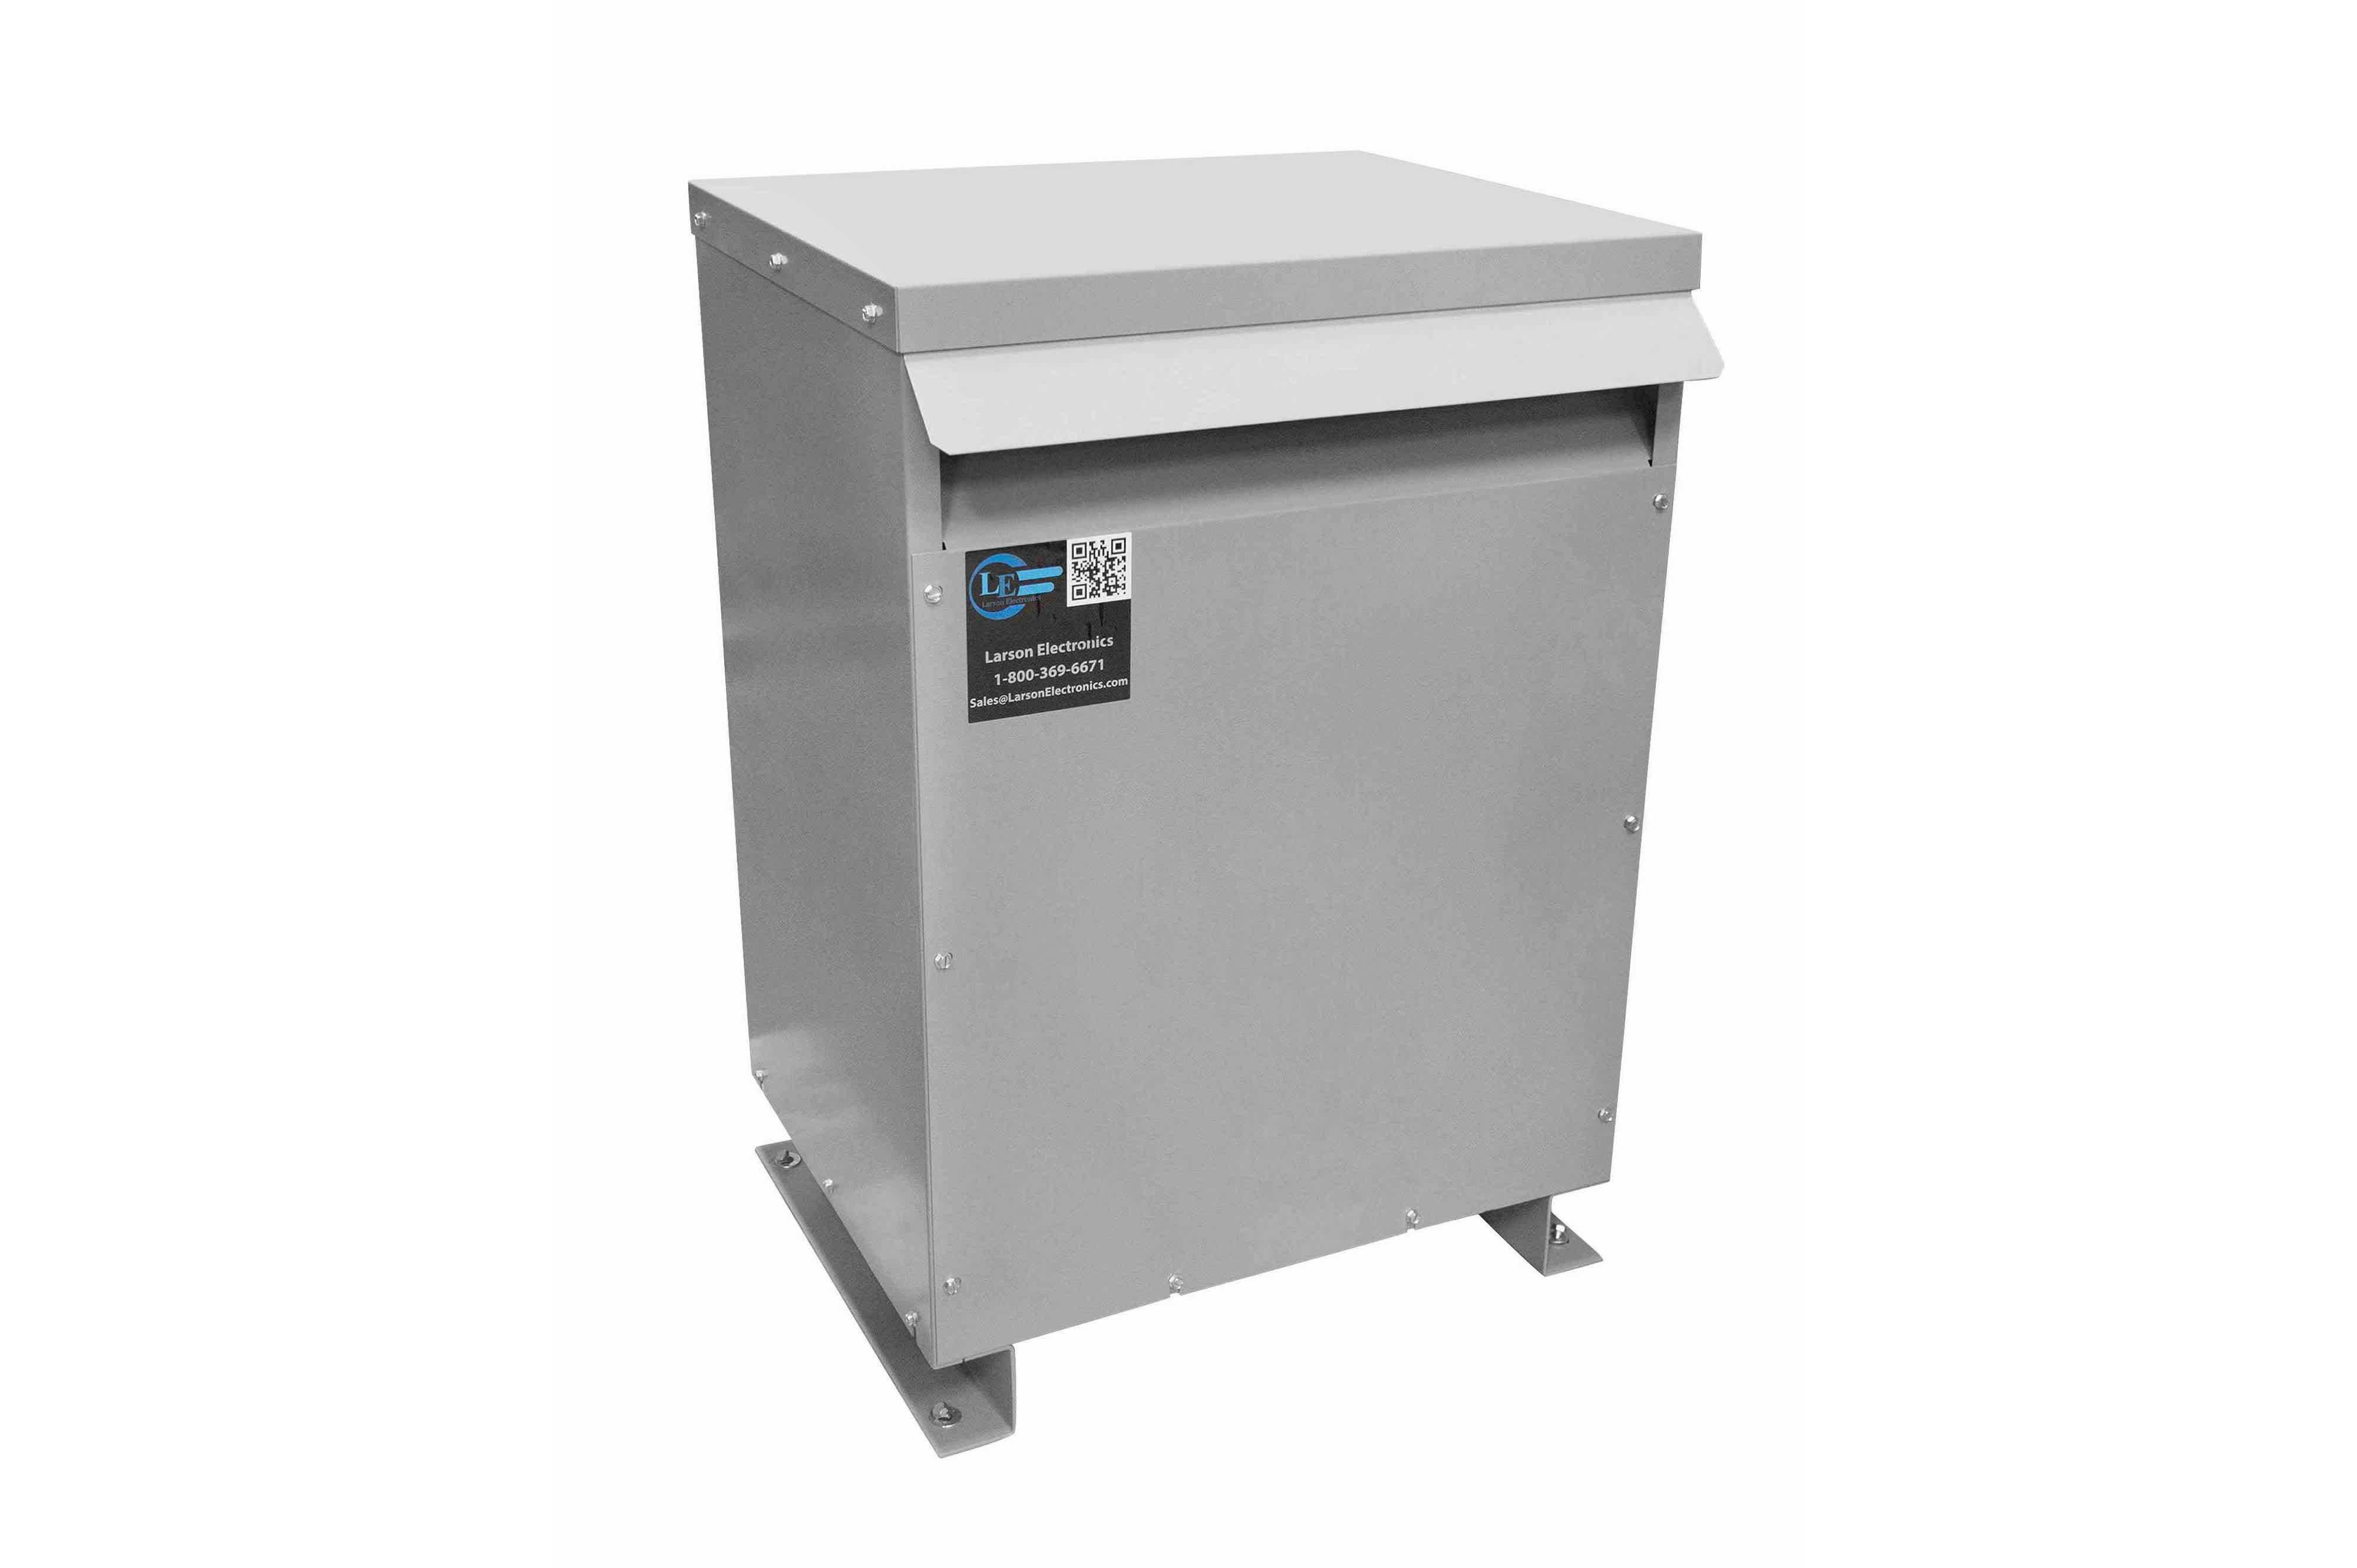 500 kVA 3PH DOE Transformer, 240V Delta Primary, 380Y/220 Wye-N Secondary, N3R, Ventilated, 60 Hz